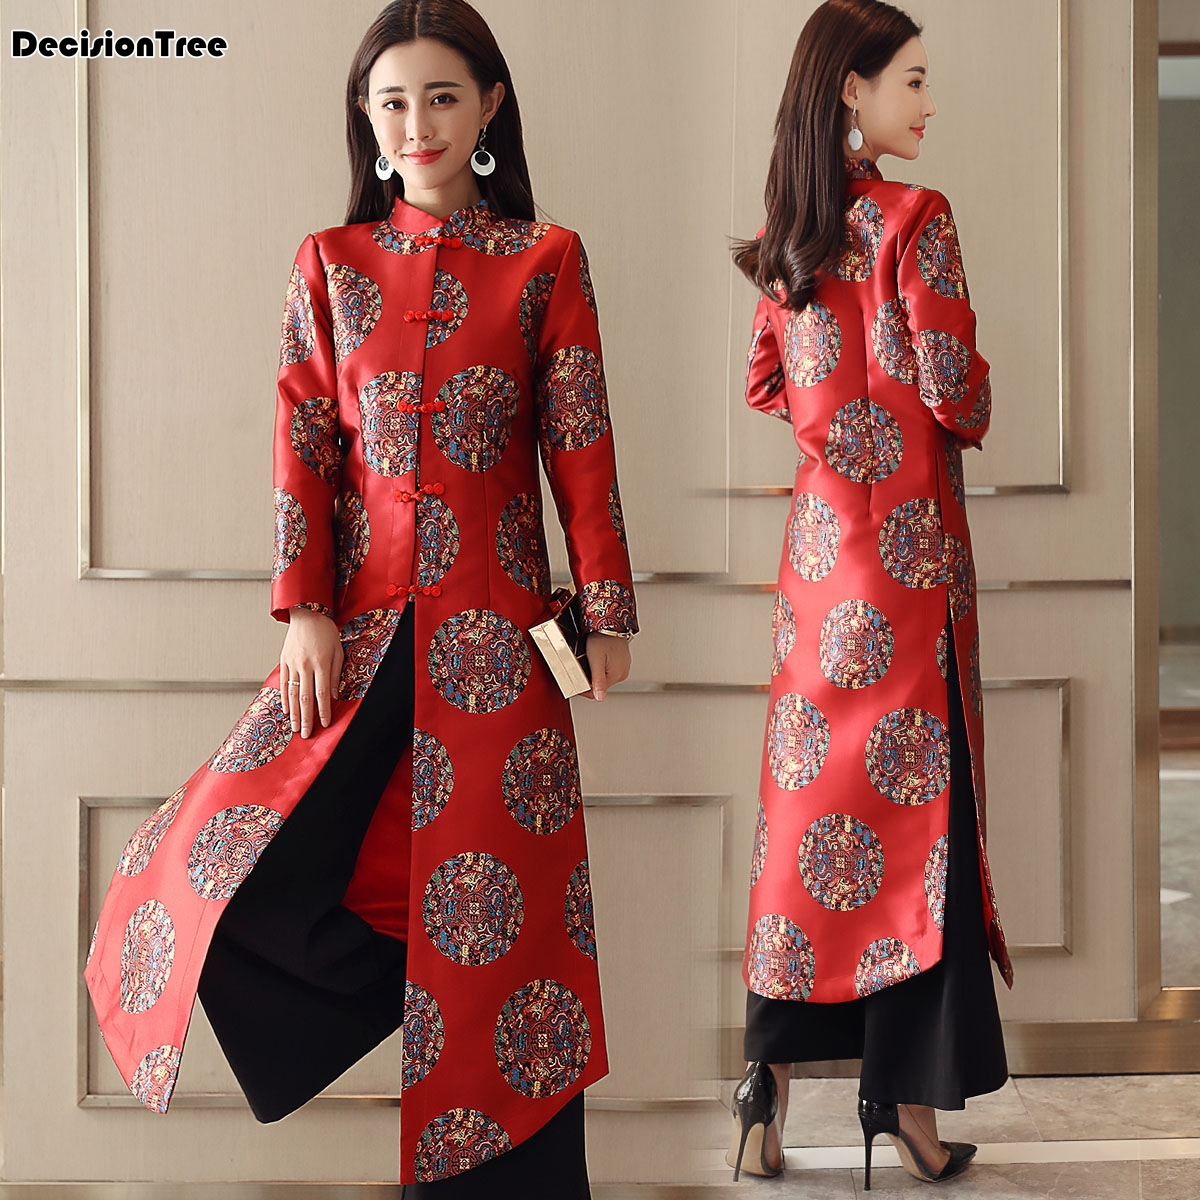 2019 Charming Retro Chinese Women Velour Cheongsam Dress Qipao Long Party Wear Cheongsam Chinese Dress For Women Aodai Dress